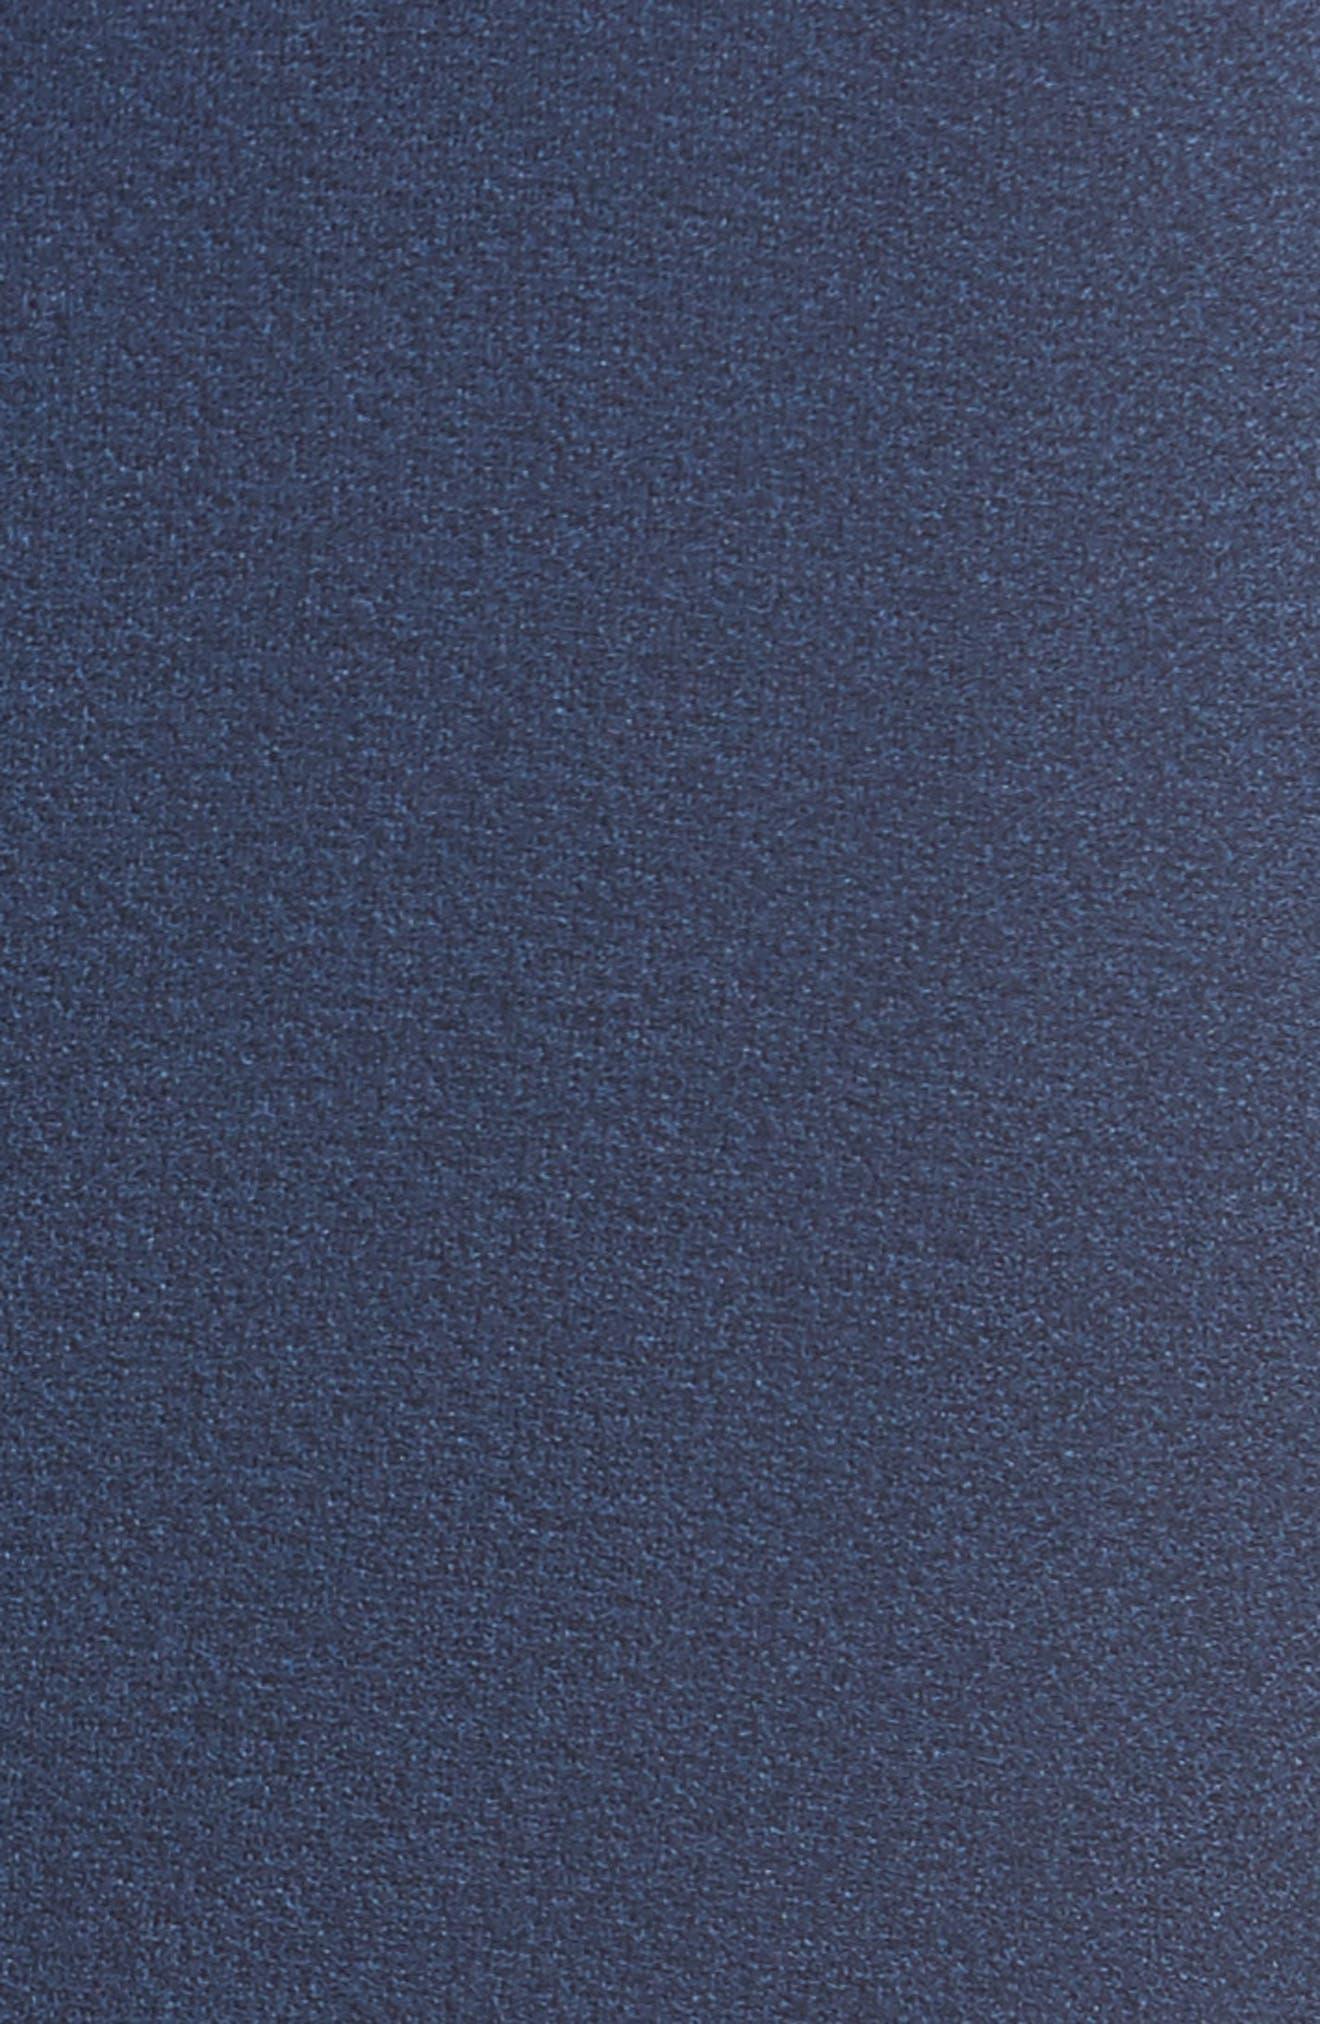 Hailey Crepe Dress,                             Alternate thumbnail 144, color,